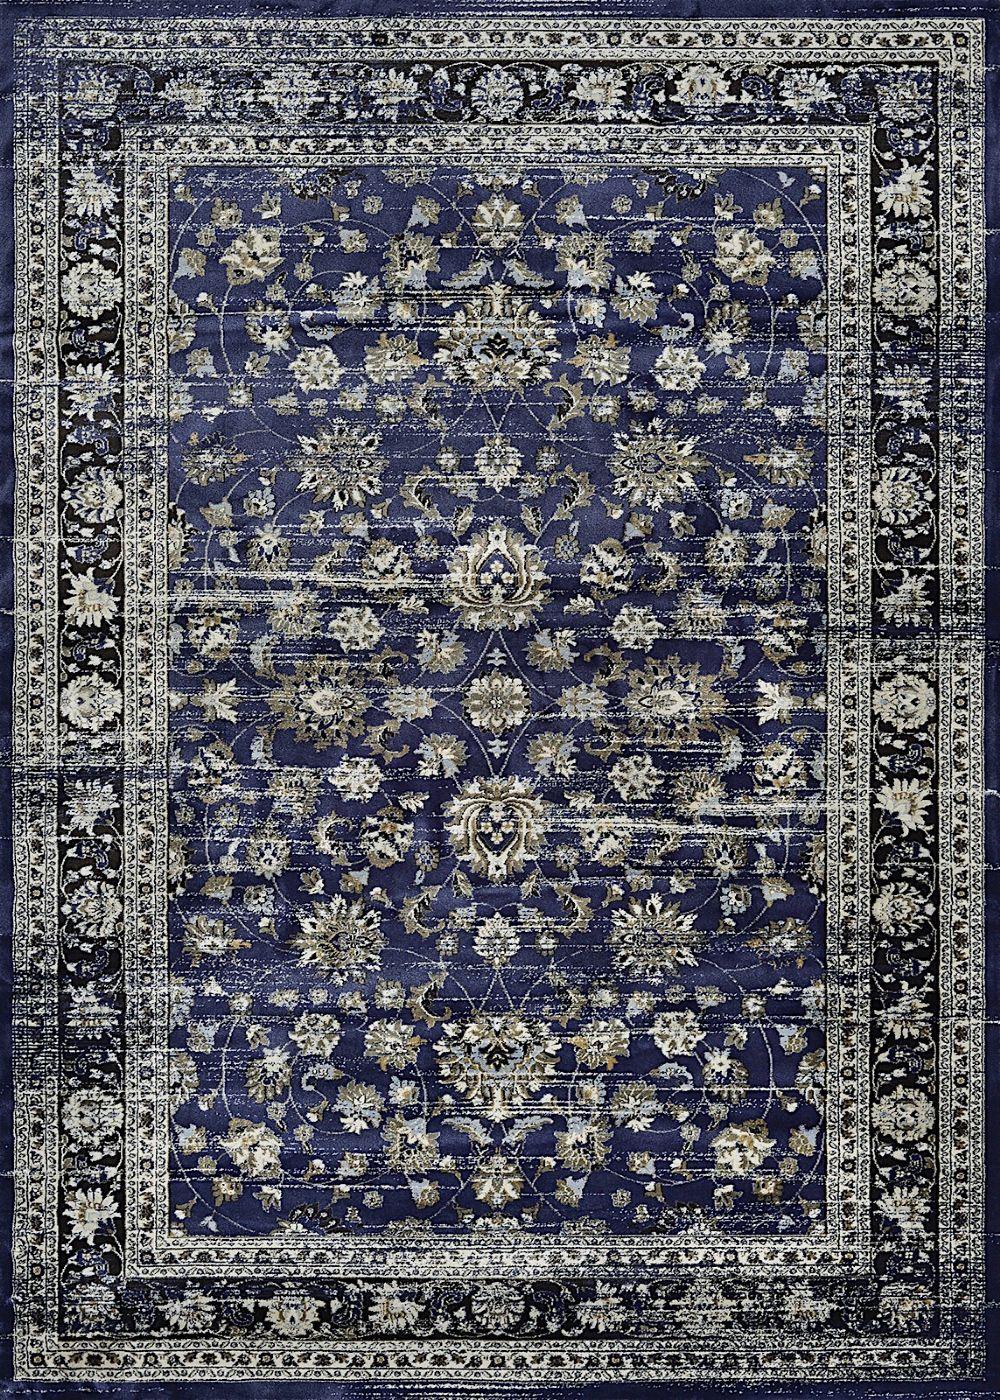 couristan zahara traditional area rug collection